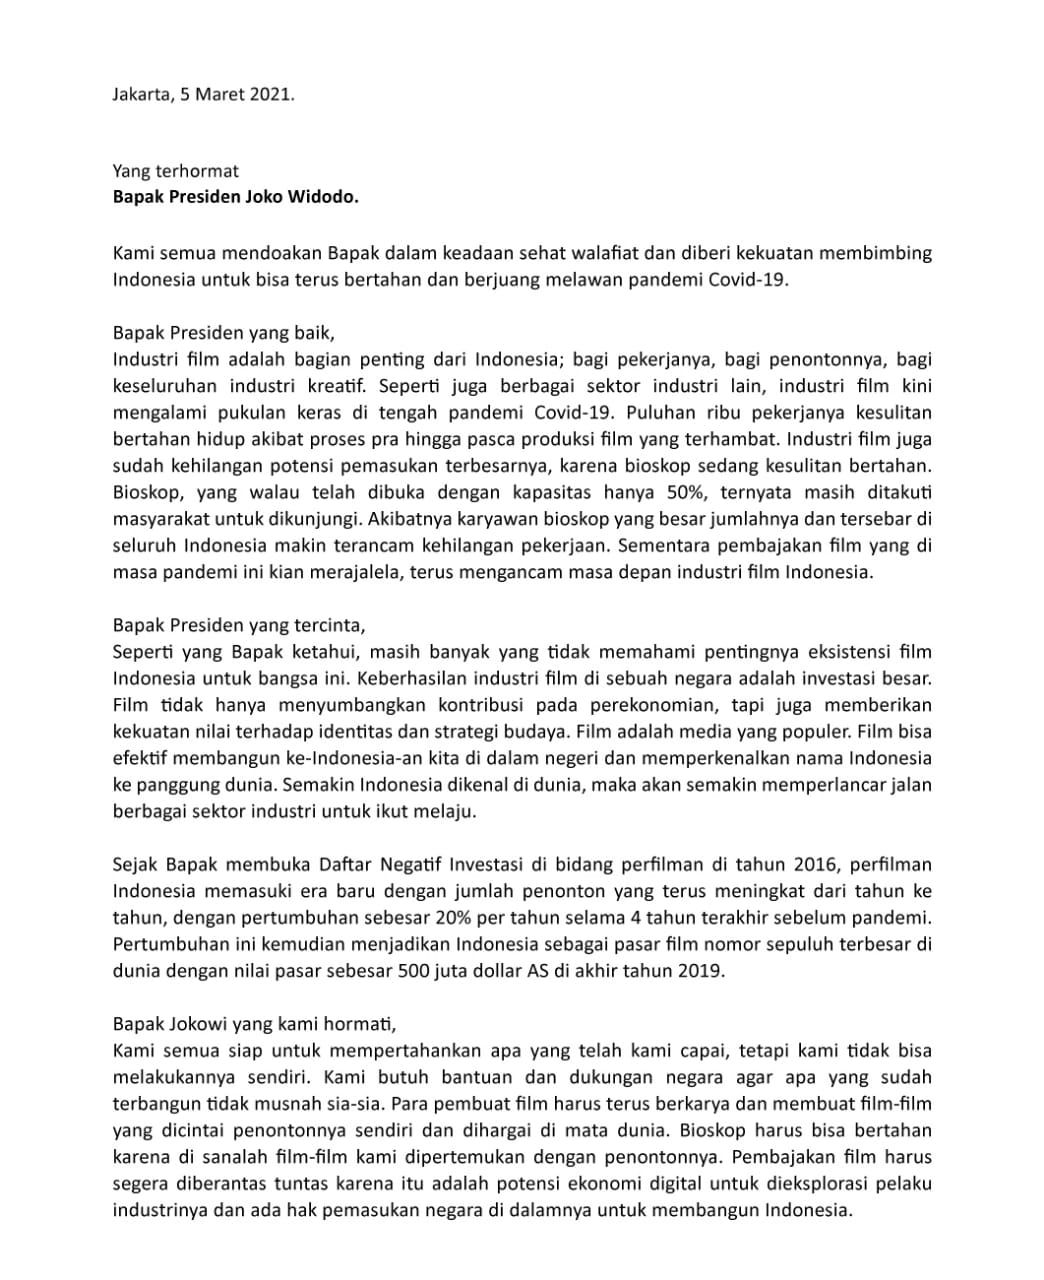 Surat Insan Film Indonesia ke Presiden Joko Widodo